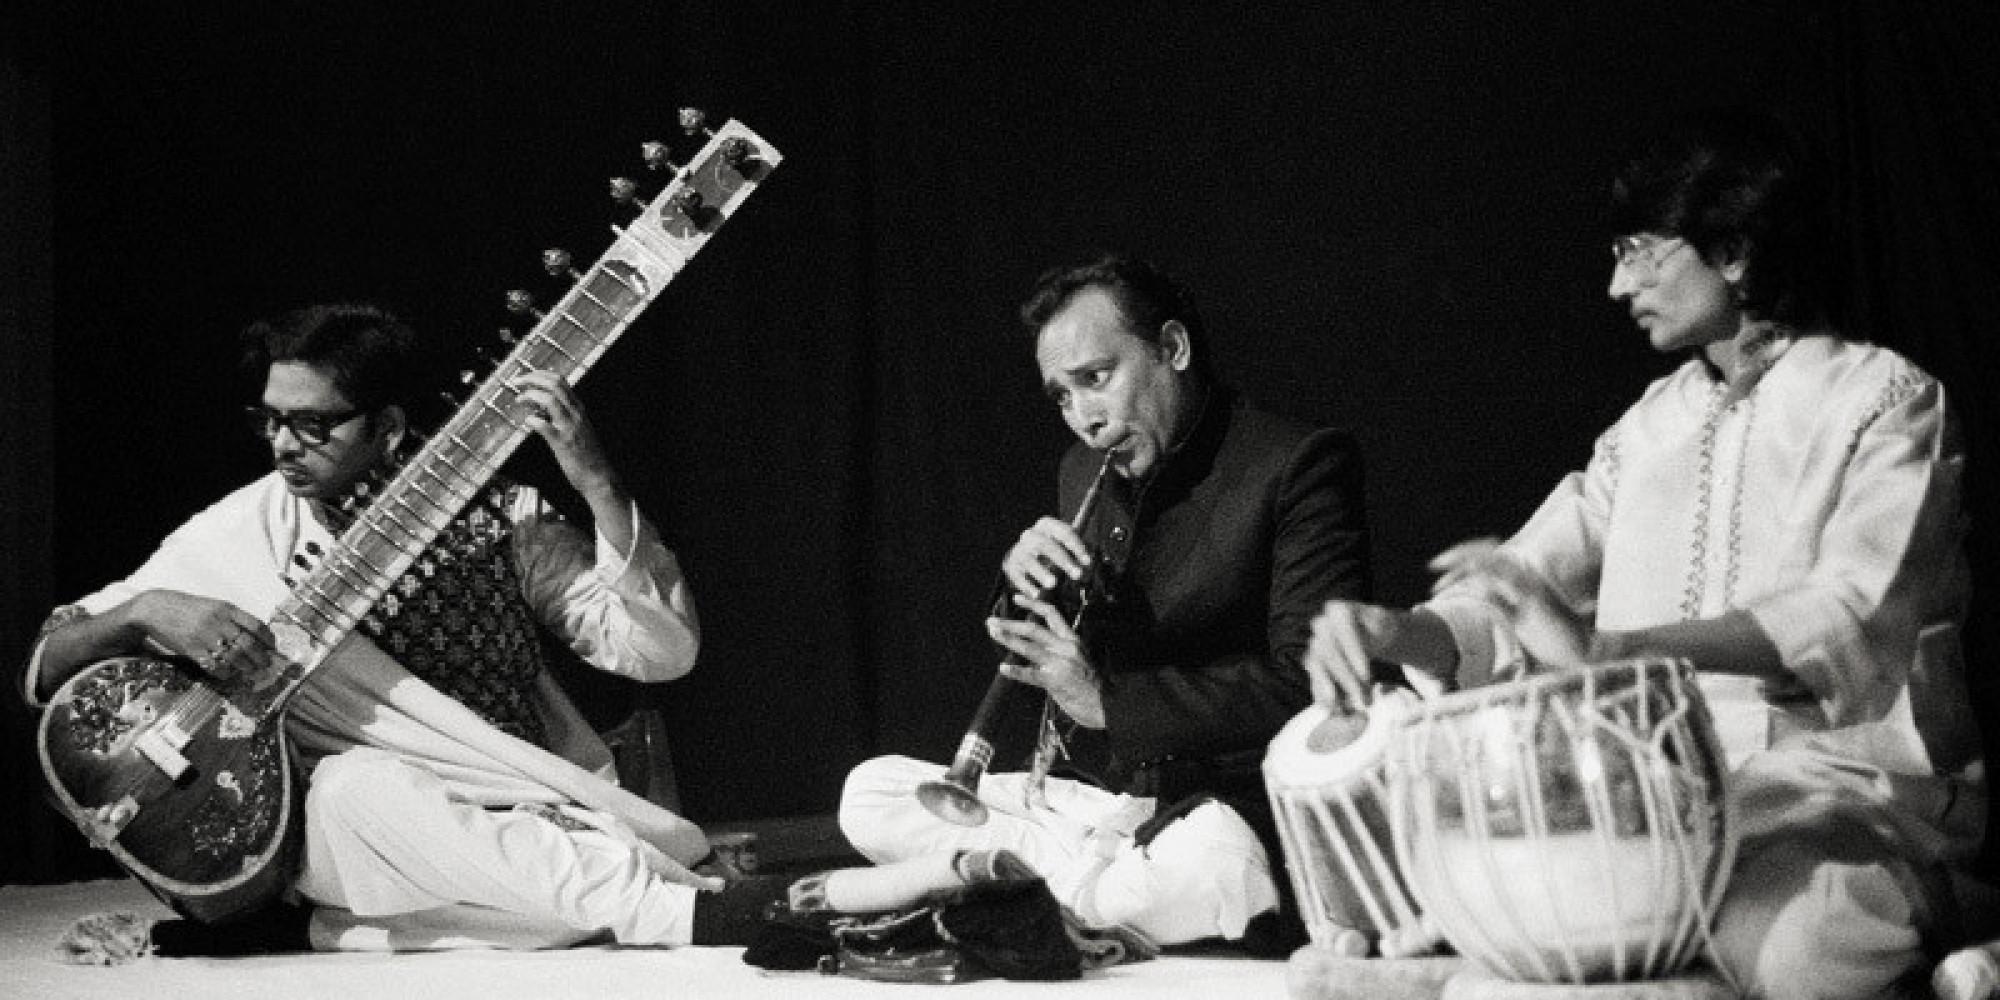 classical music indian ensemble india carnatic wikipedia channel facts instruments healing radio pandit contemplation medicine mishra prakash maharaj khadim khan